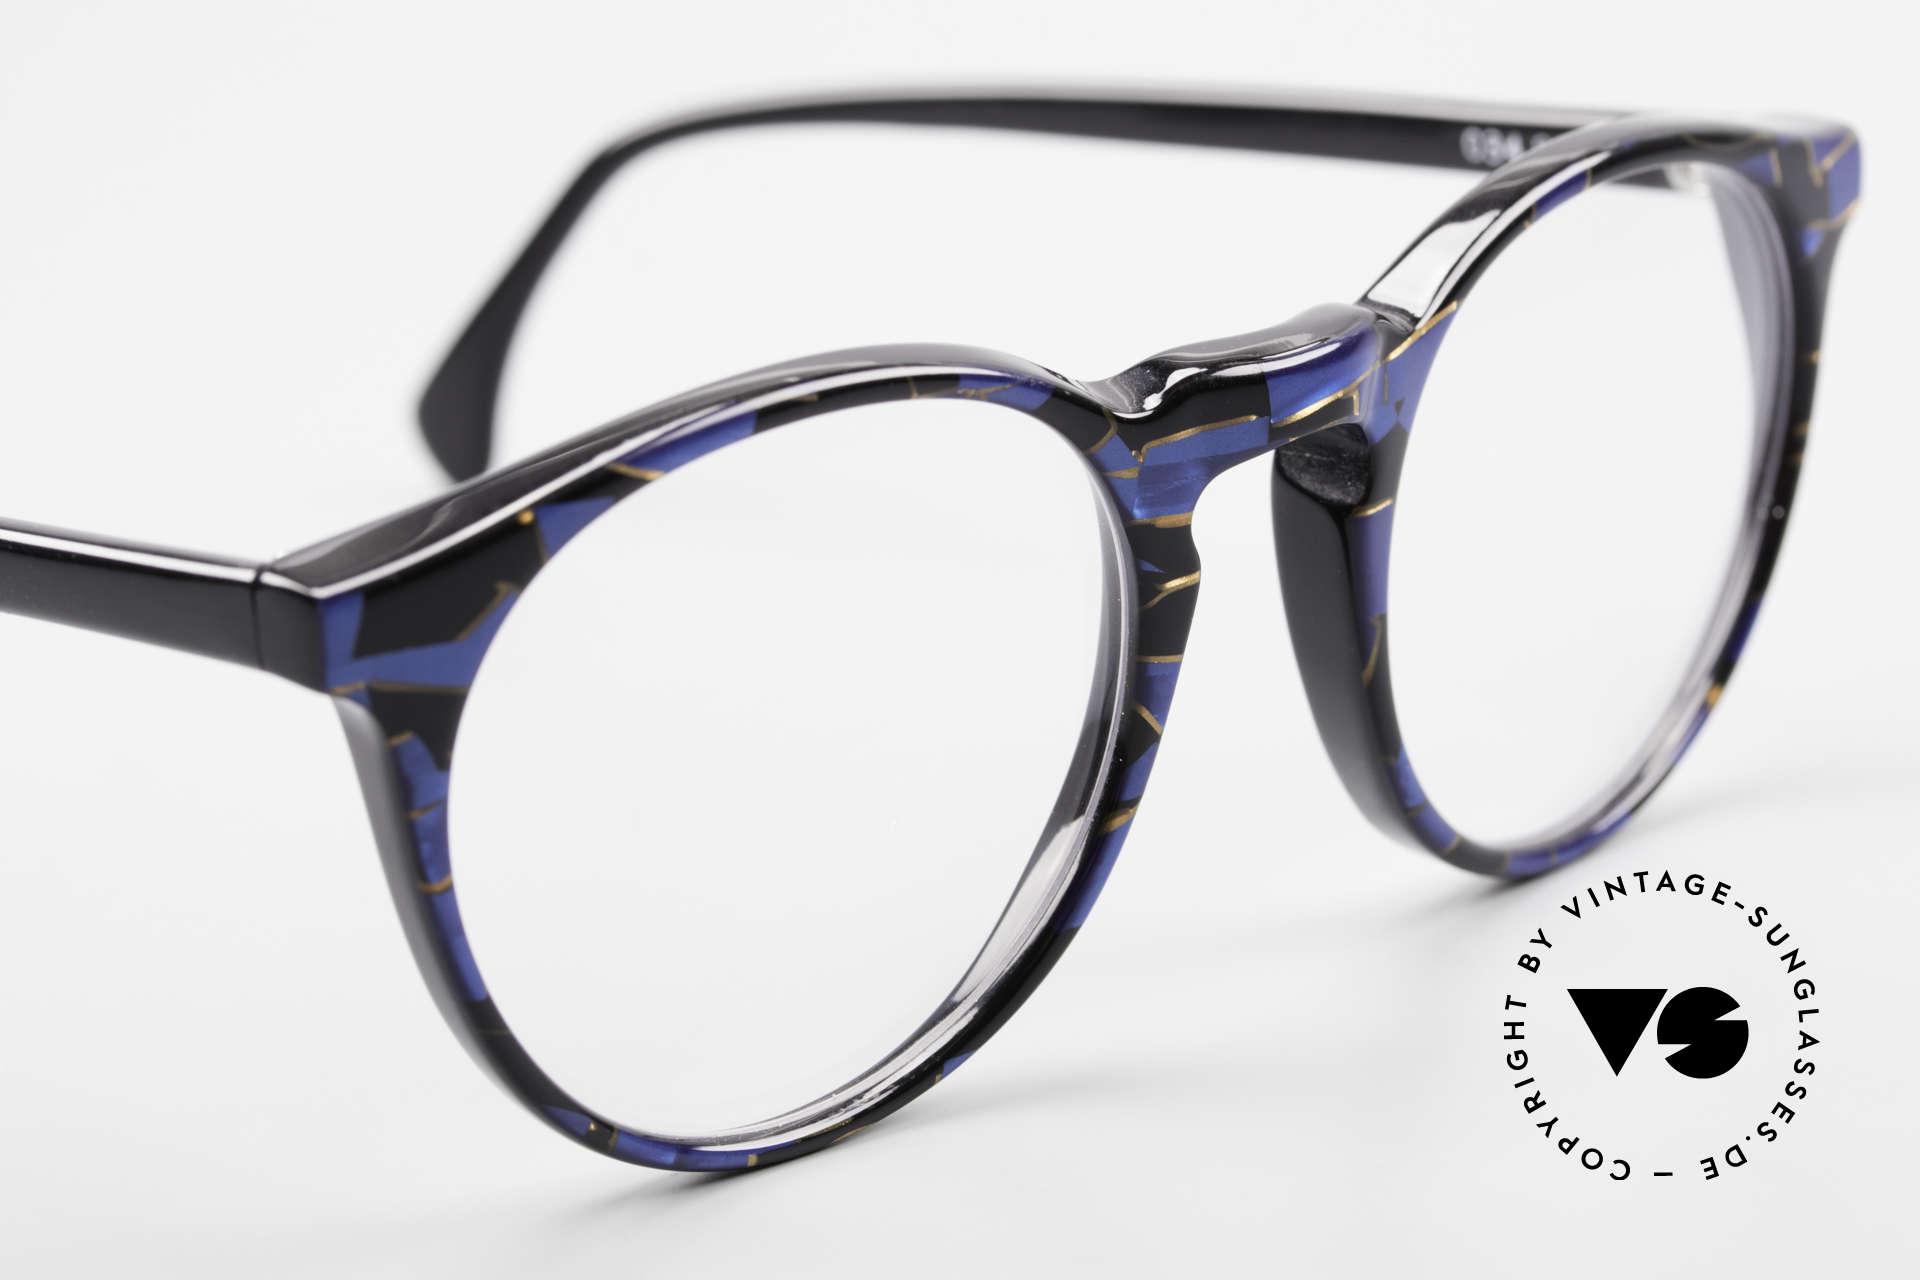 Alain Mikli 034 / 898 Panto Designer Eyeglasses, NO RETRO frame, but an old ORIGINAL from 1989, Made for Men and Women